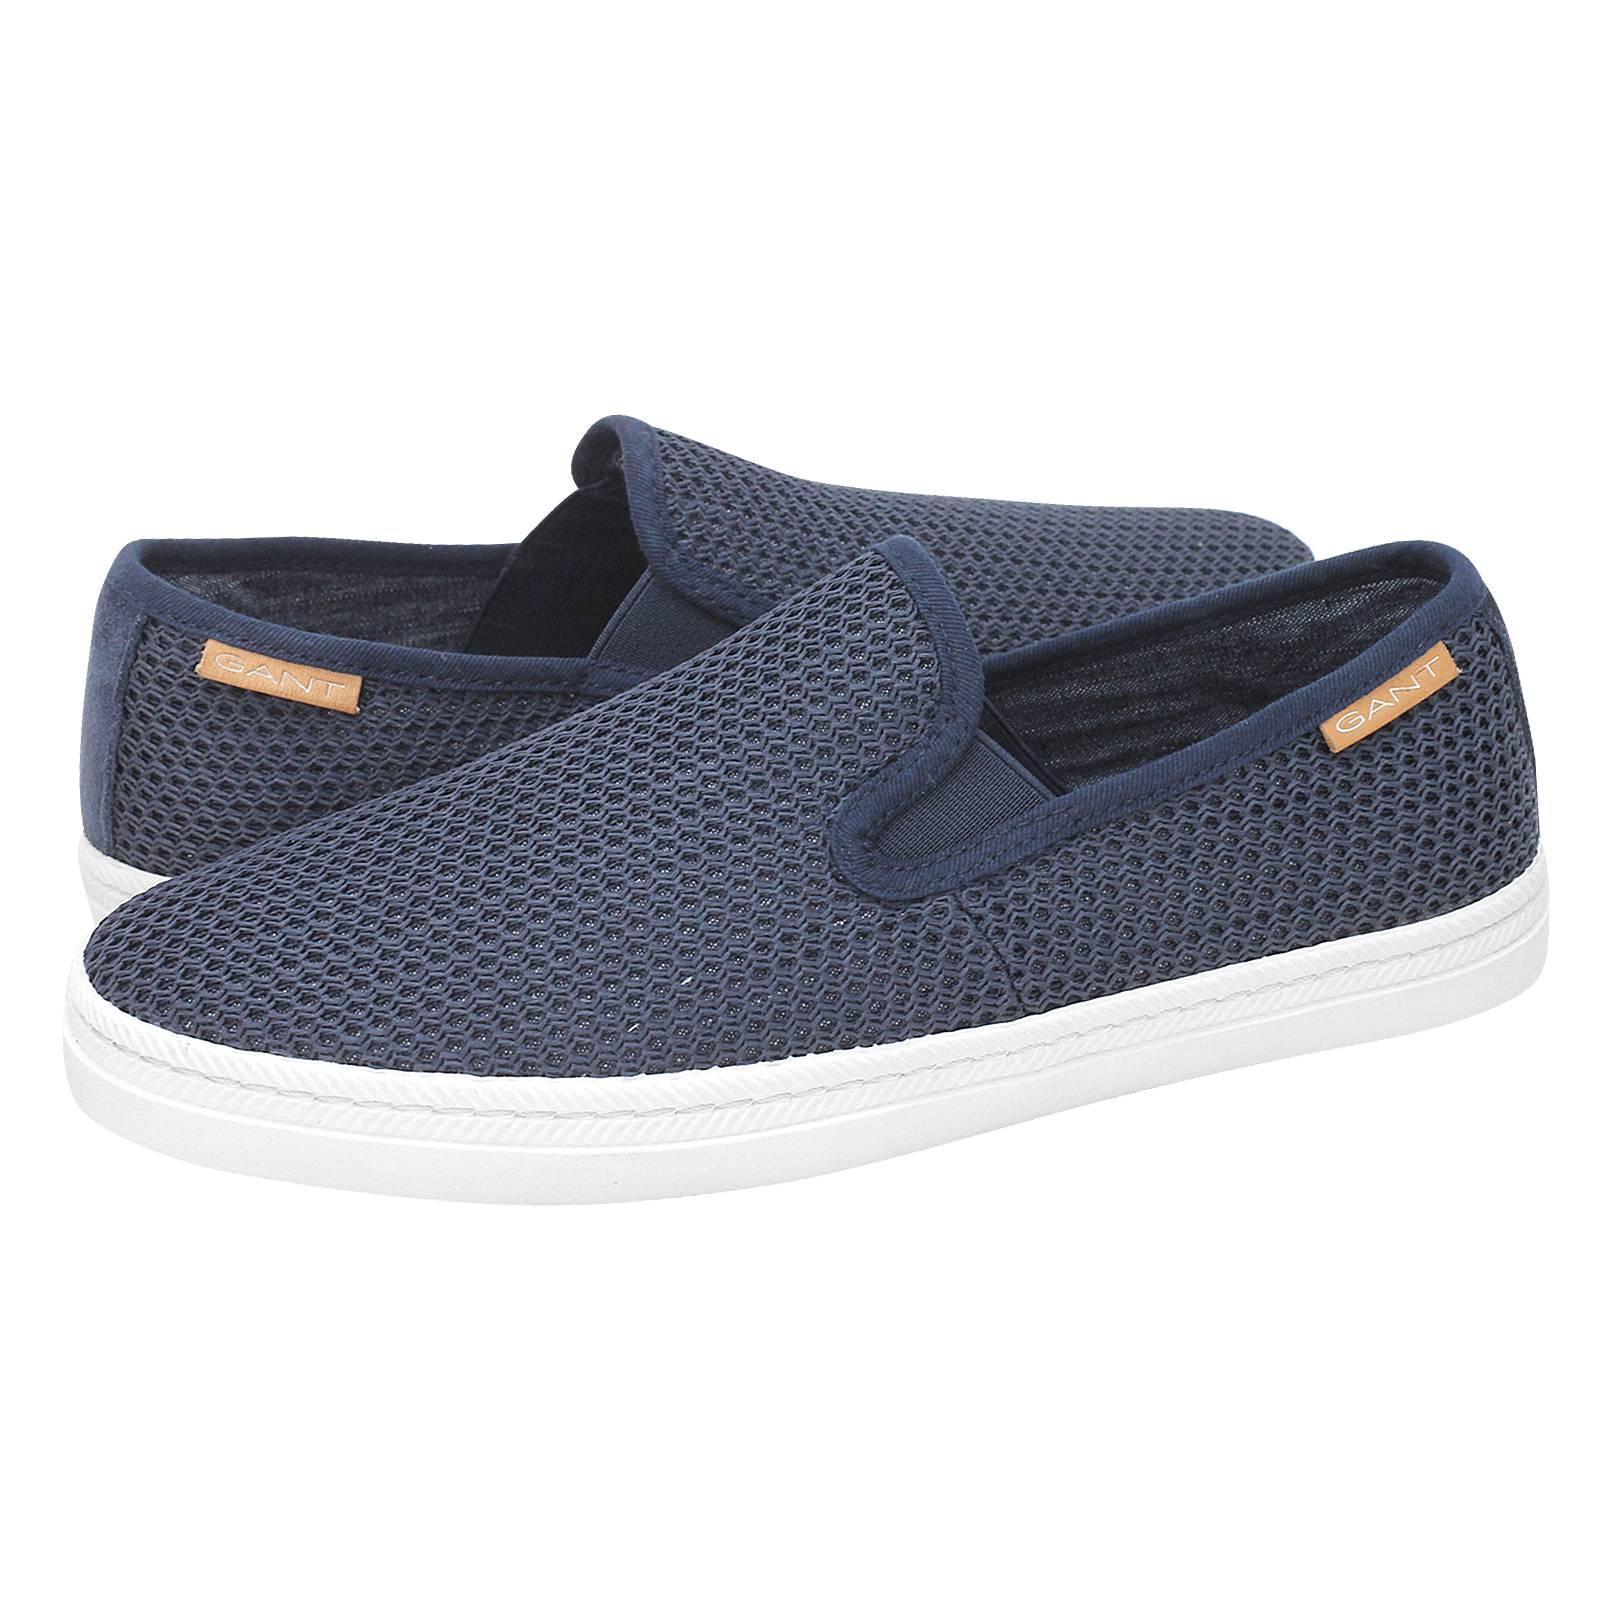 045ba9efc50f Viktor - Ανδρικά παπούτσια casual Gant από υφασμα και καστορι ...